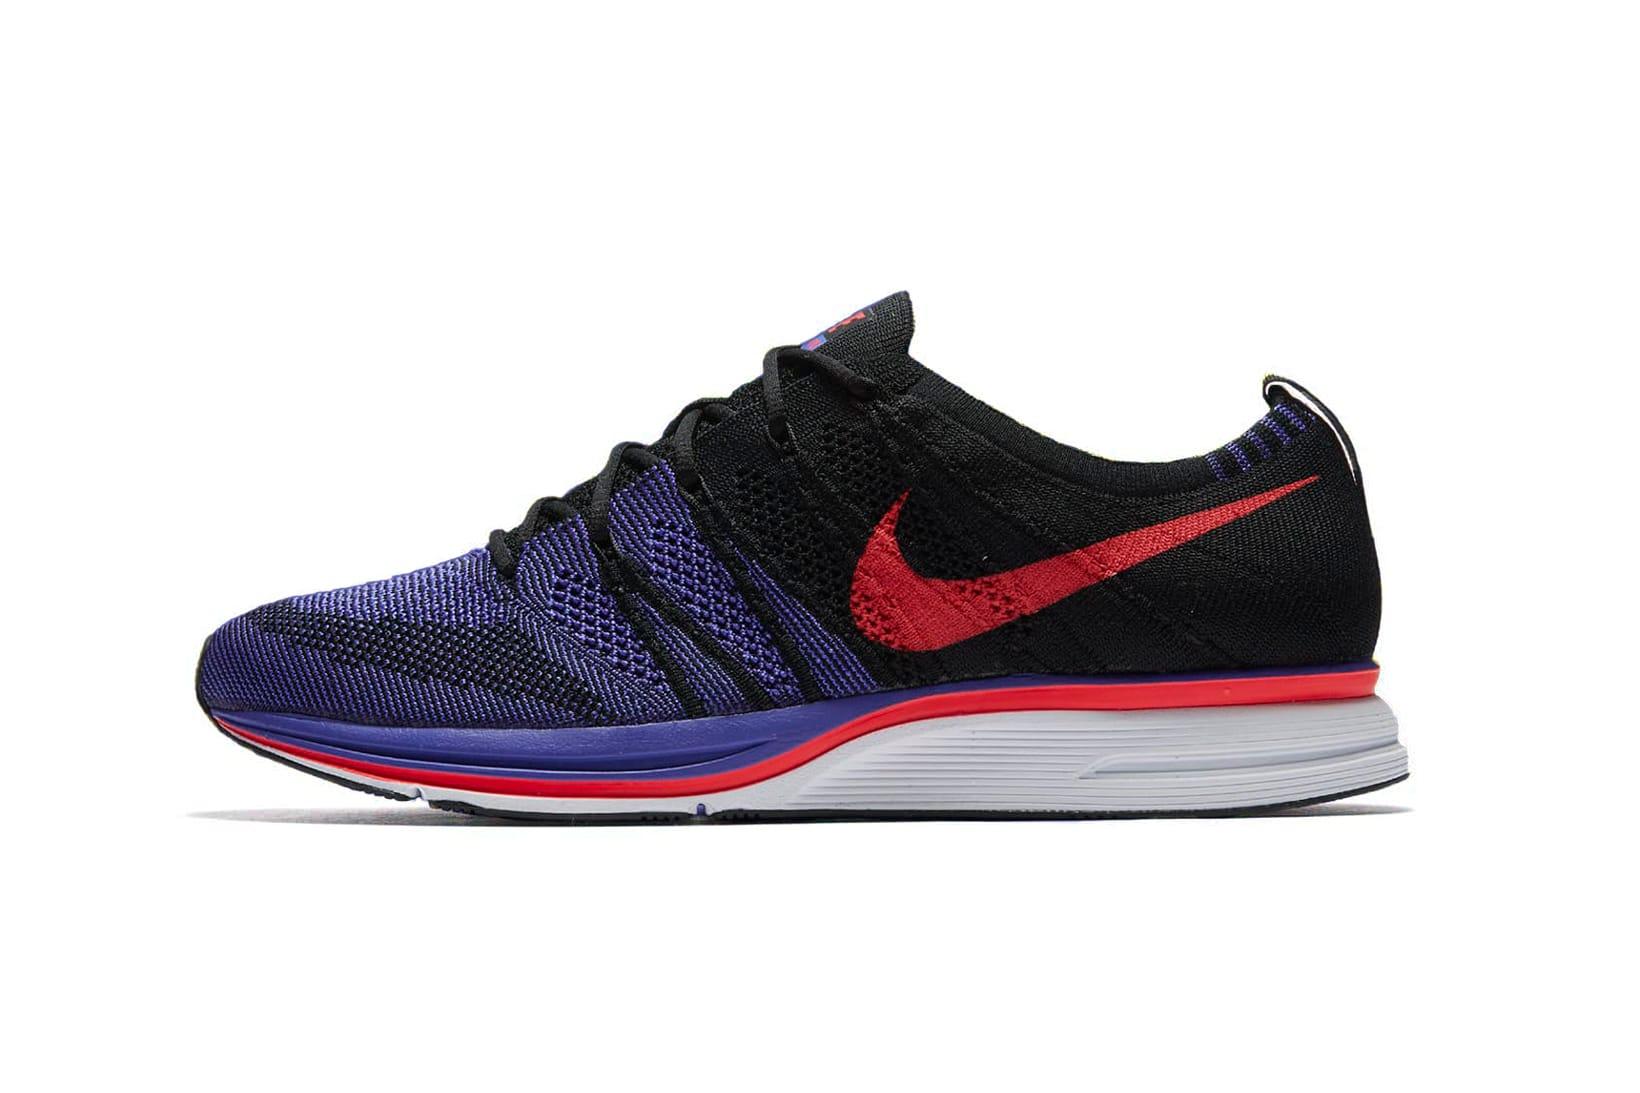 Nike Flyknit Trainer Siren Red/Persian